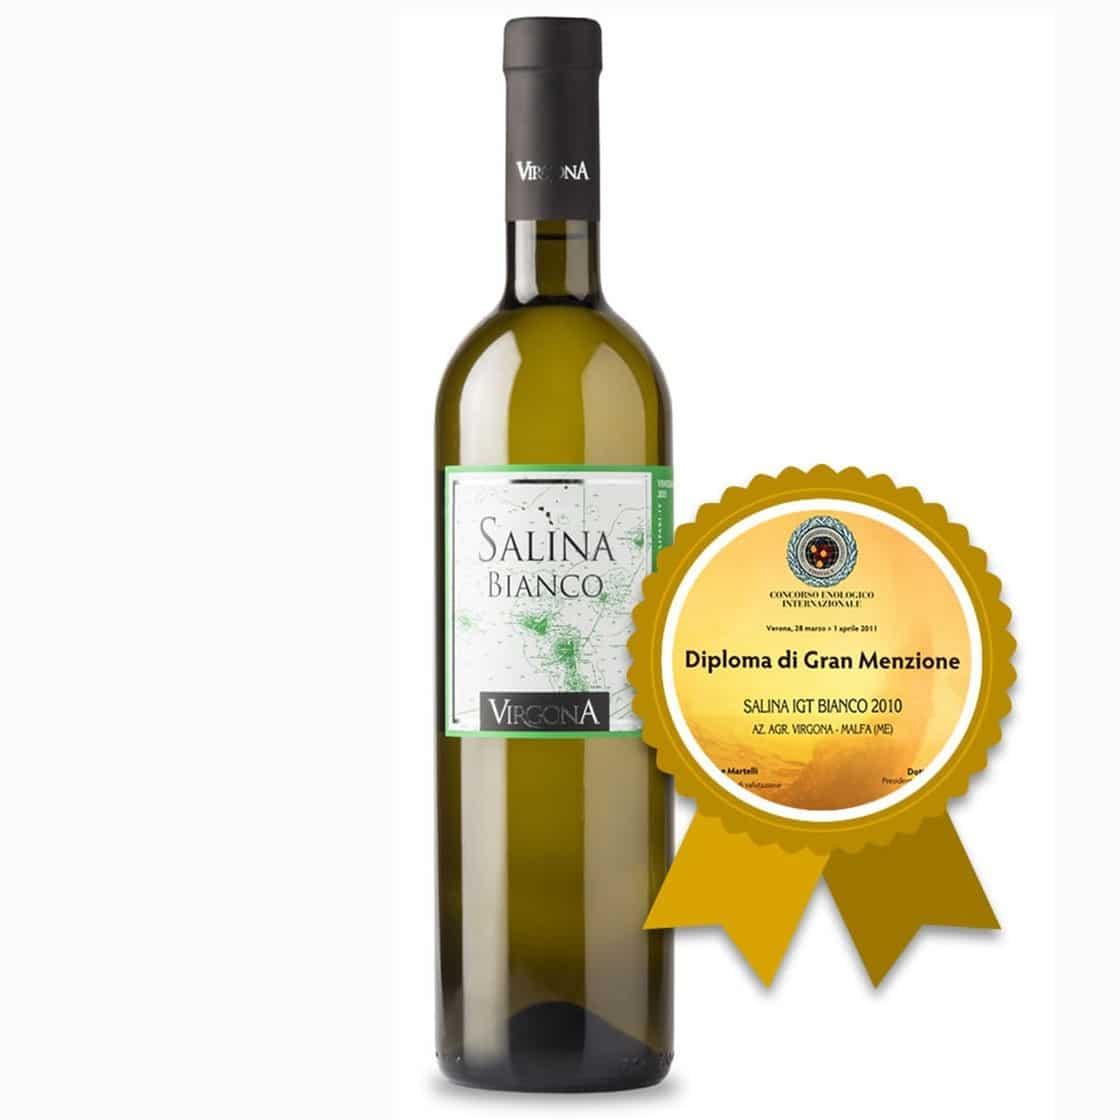 Salina Bianco I.G.T. 75cl 2018 – Virgona